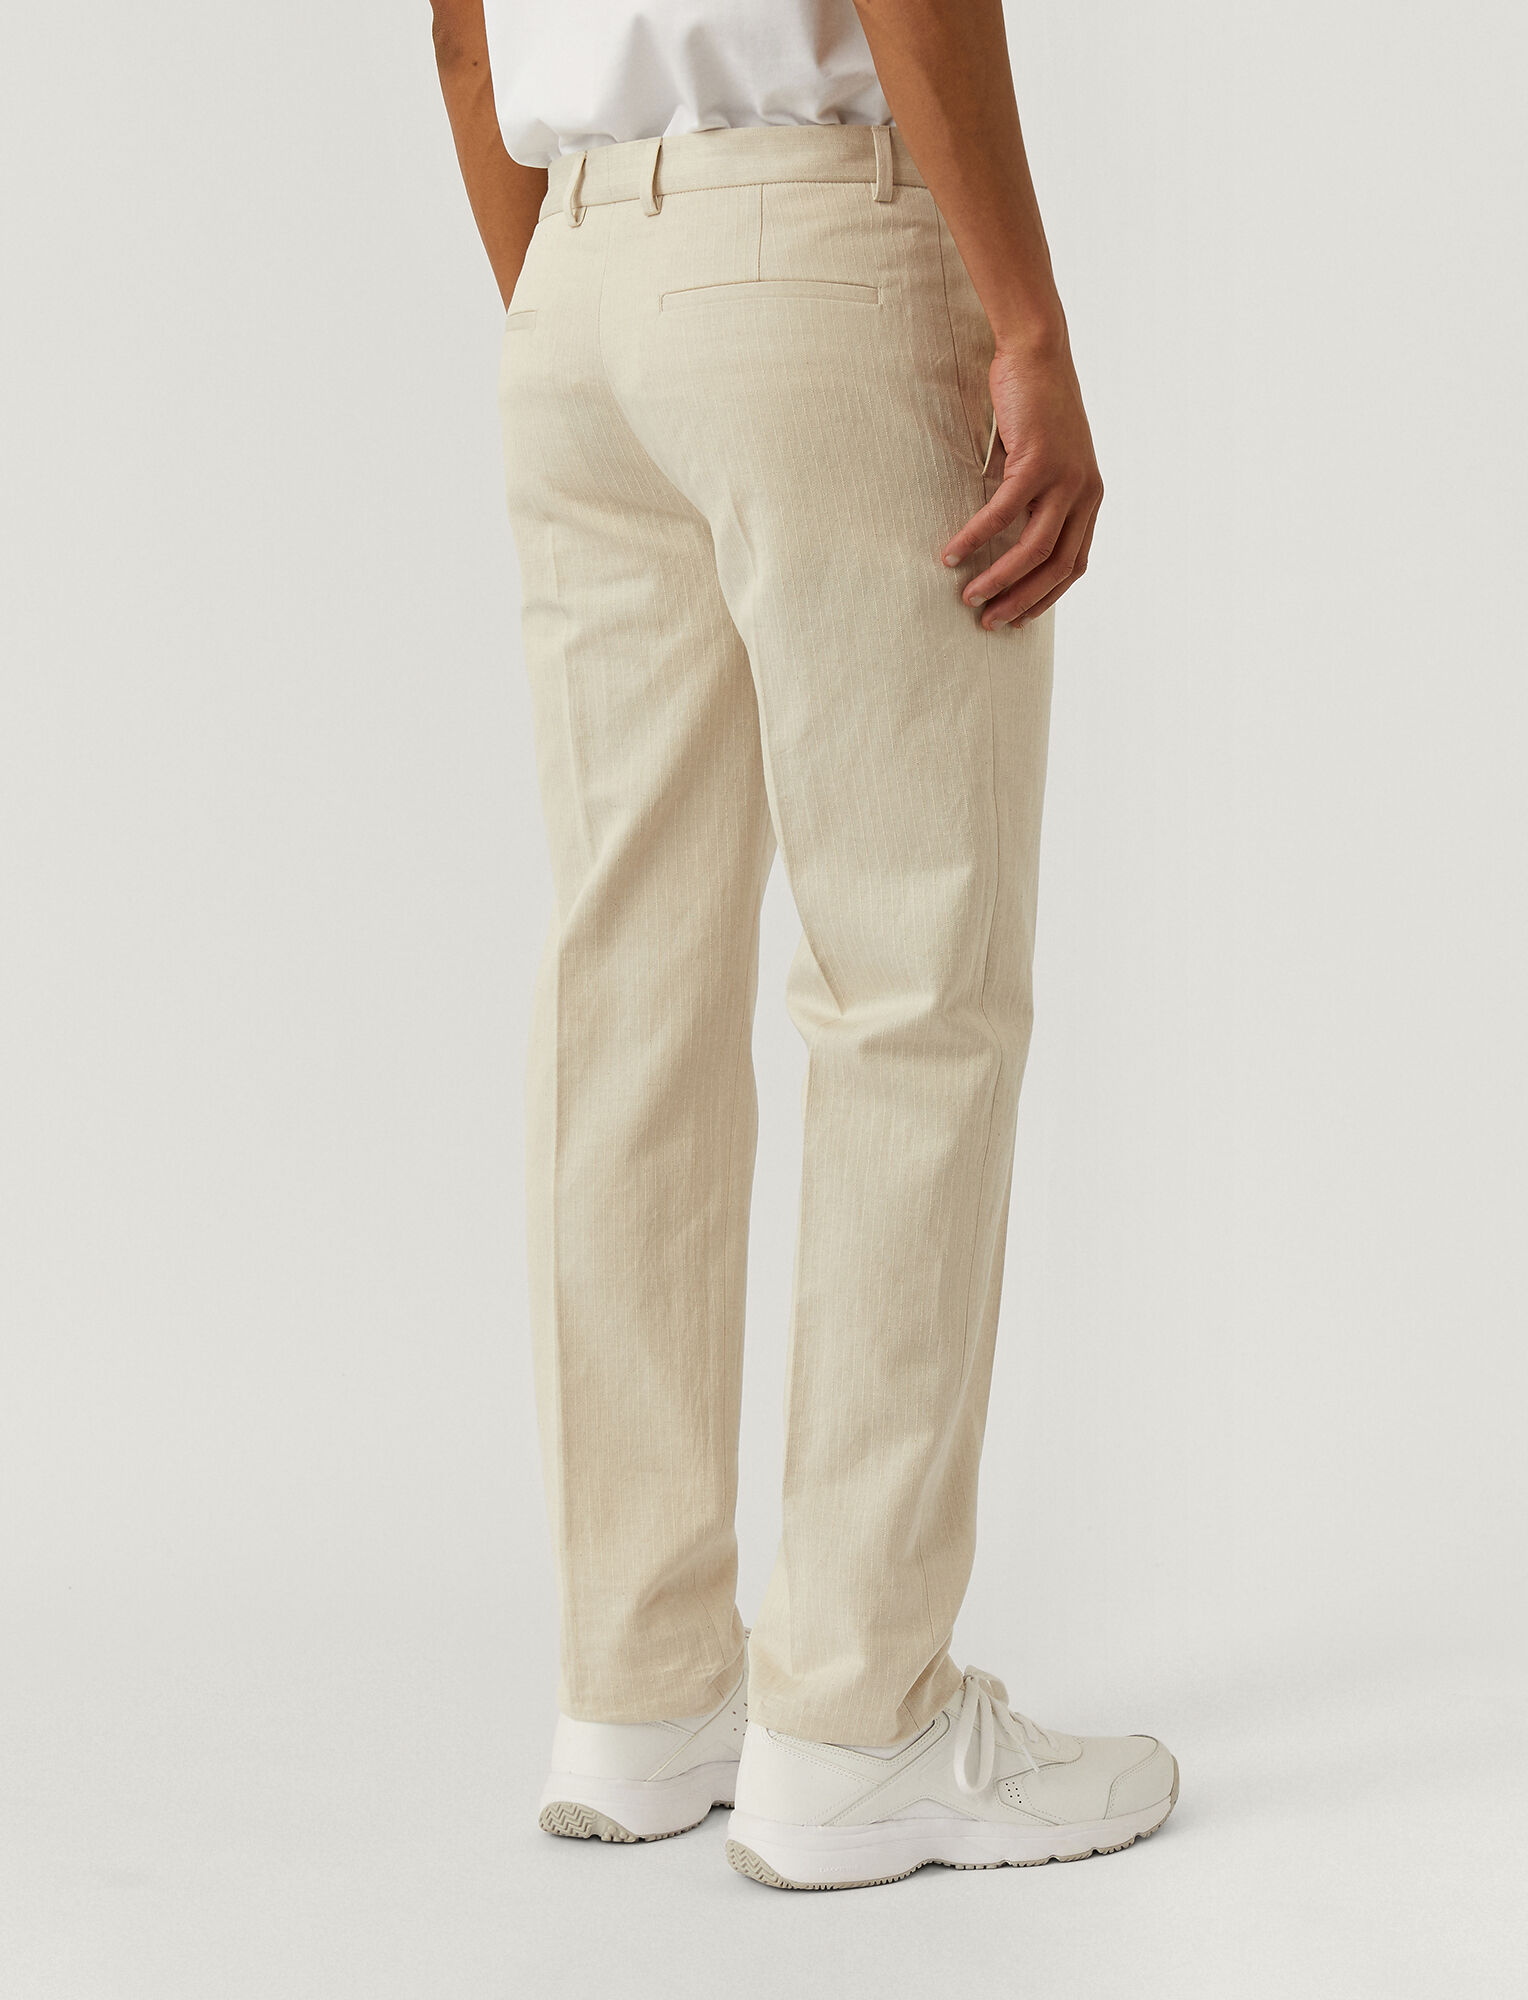 Joseph, Pantalon Jack en dobby de coton et de lin, in ECRU